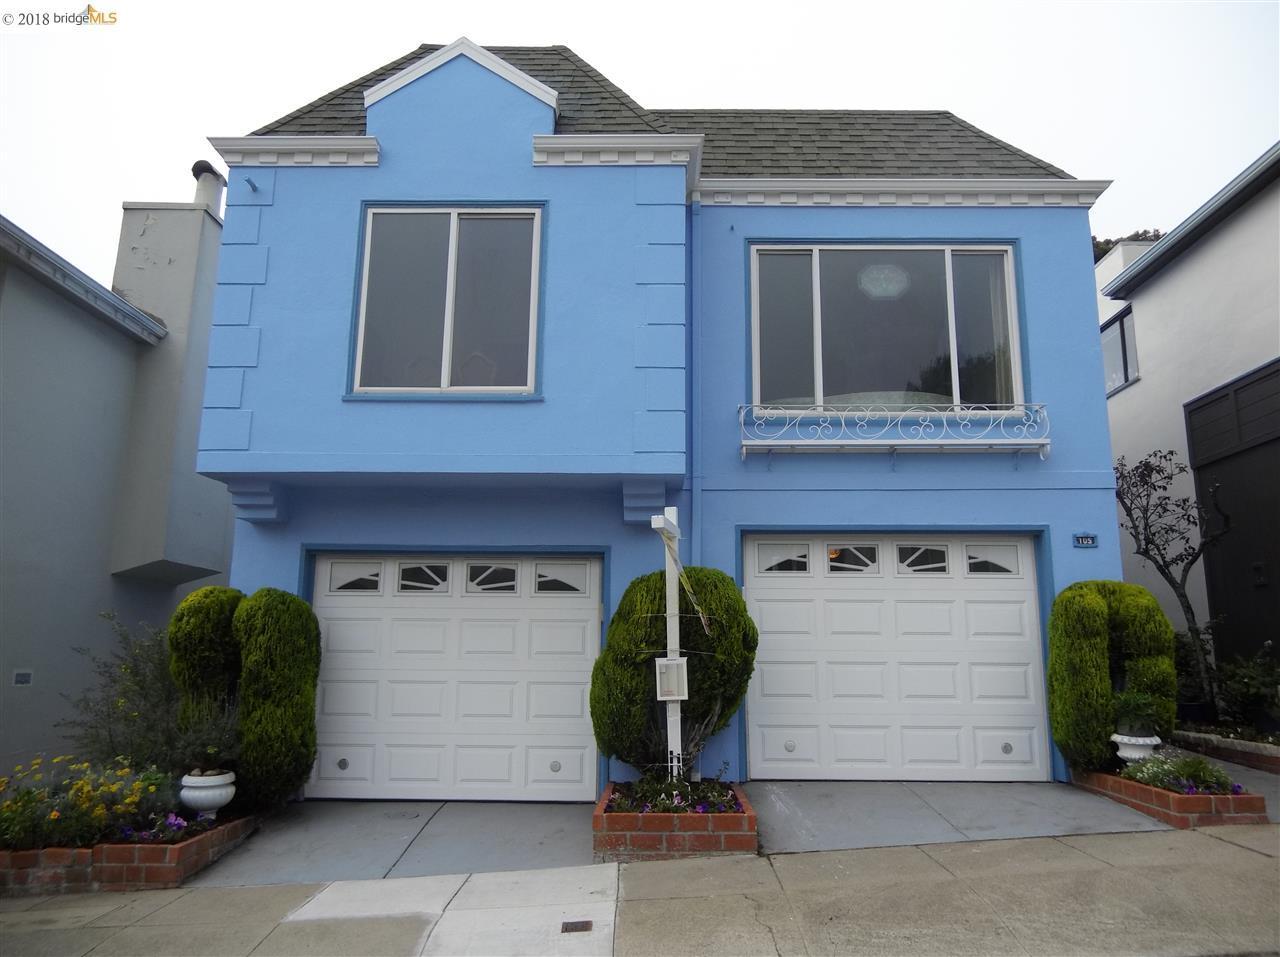 105 Marview Way, San Francisco, CA, 94131, MLS # 40831103 | Marvin ...